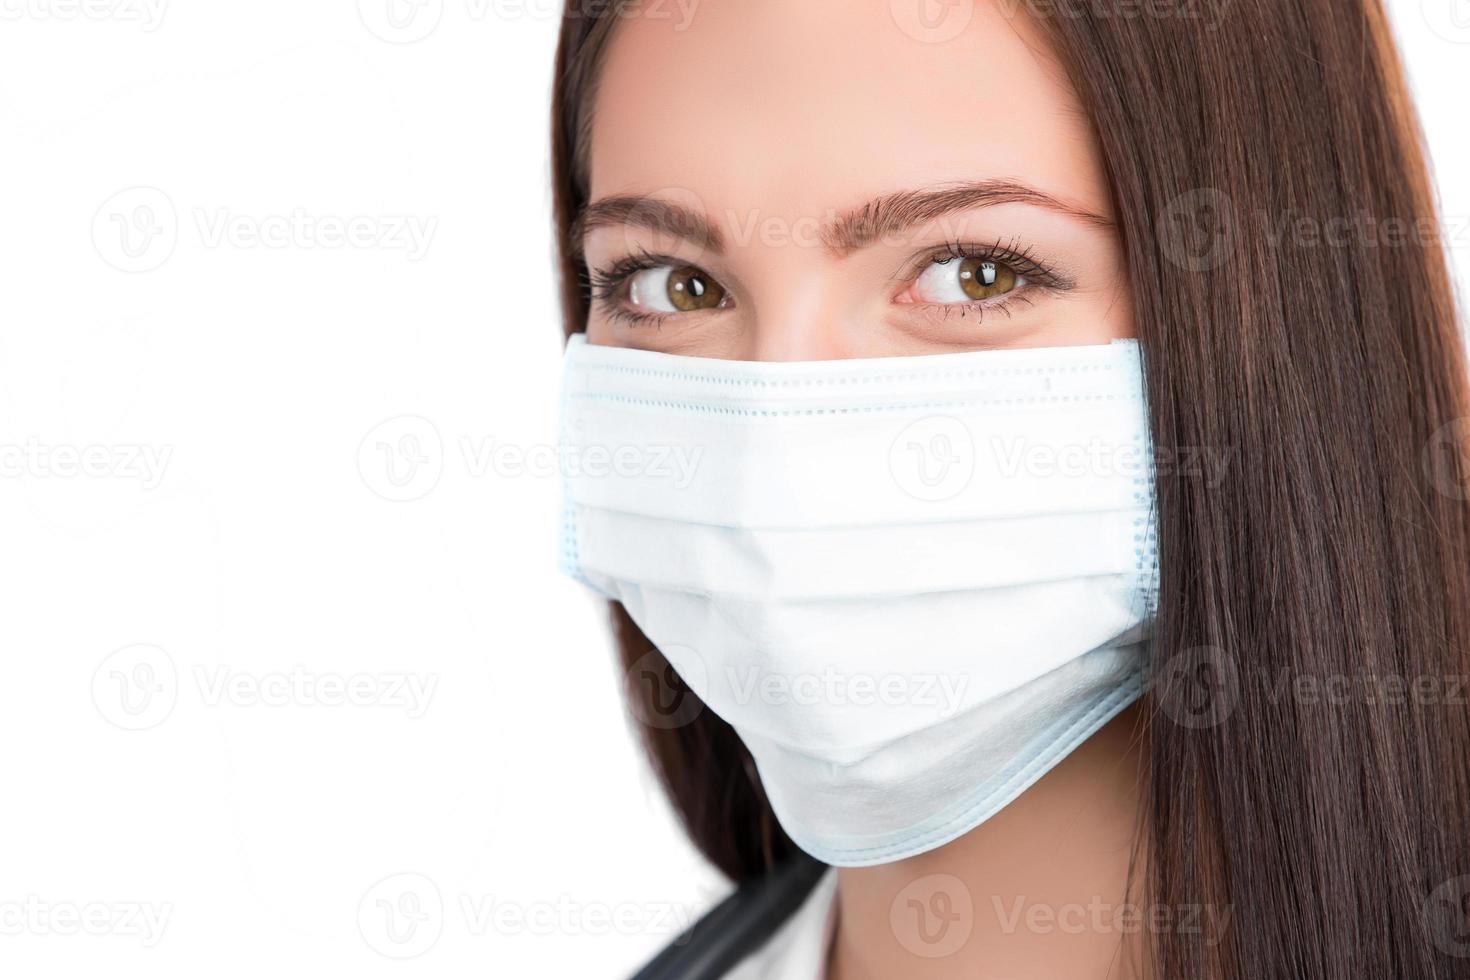 Arzt mit OP-Maske foto